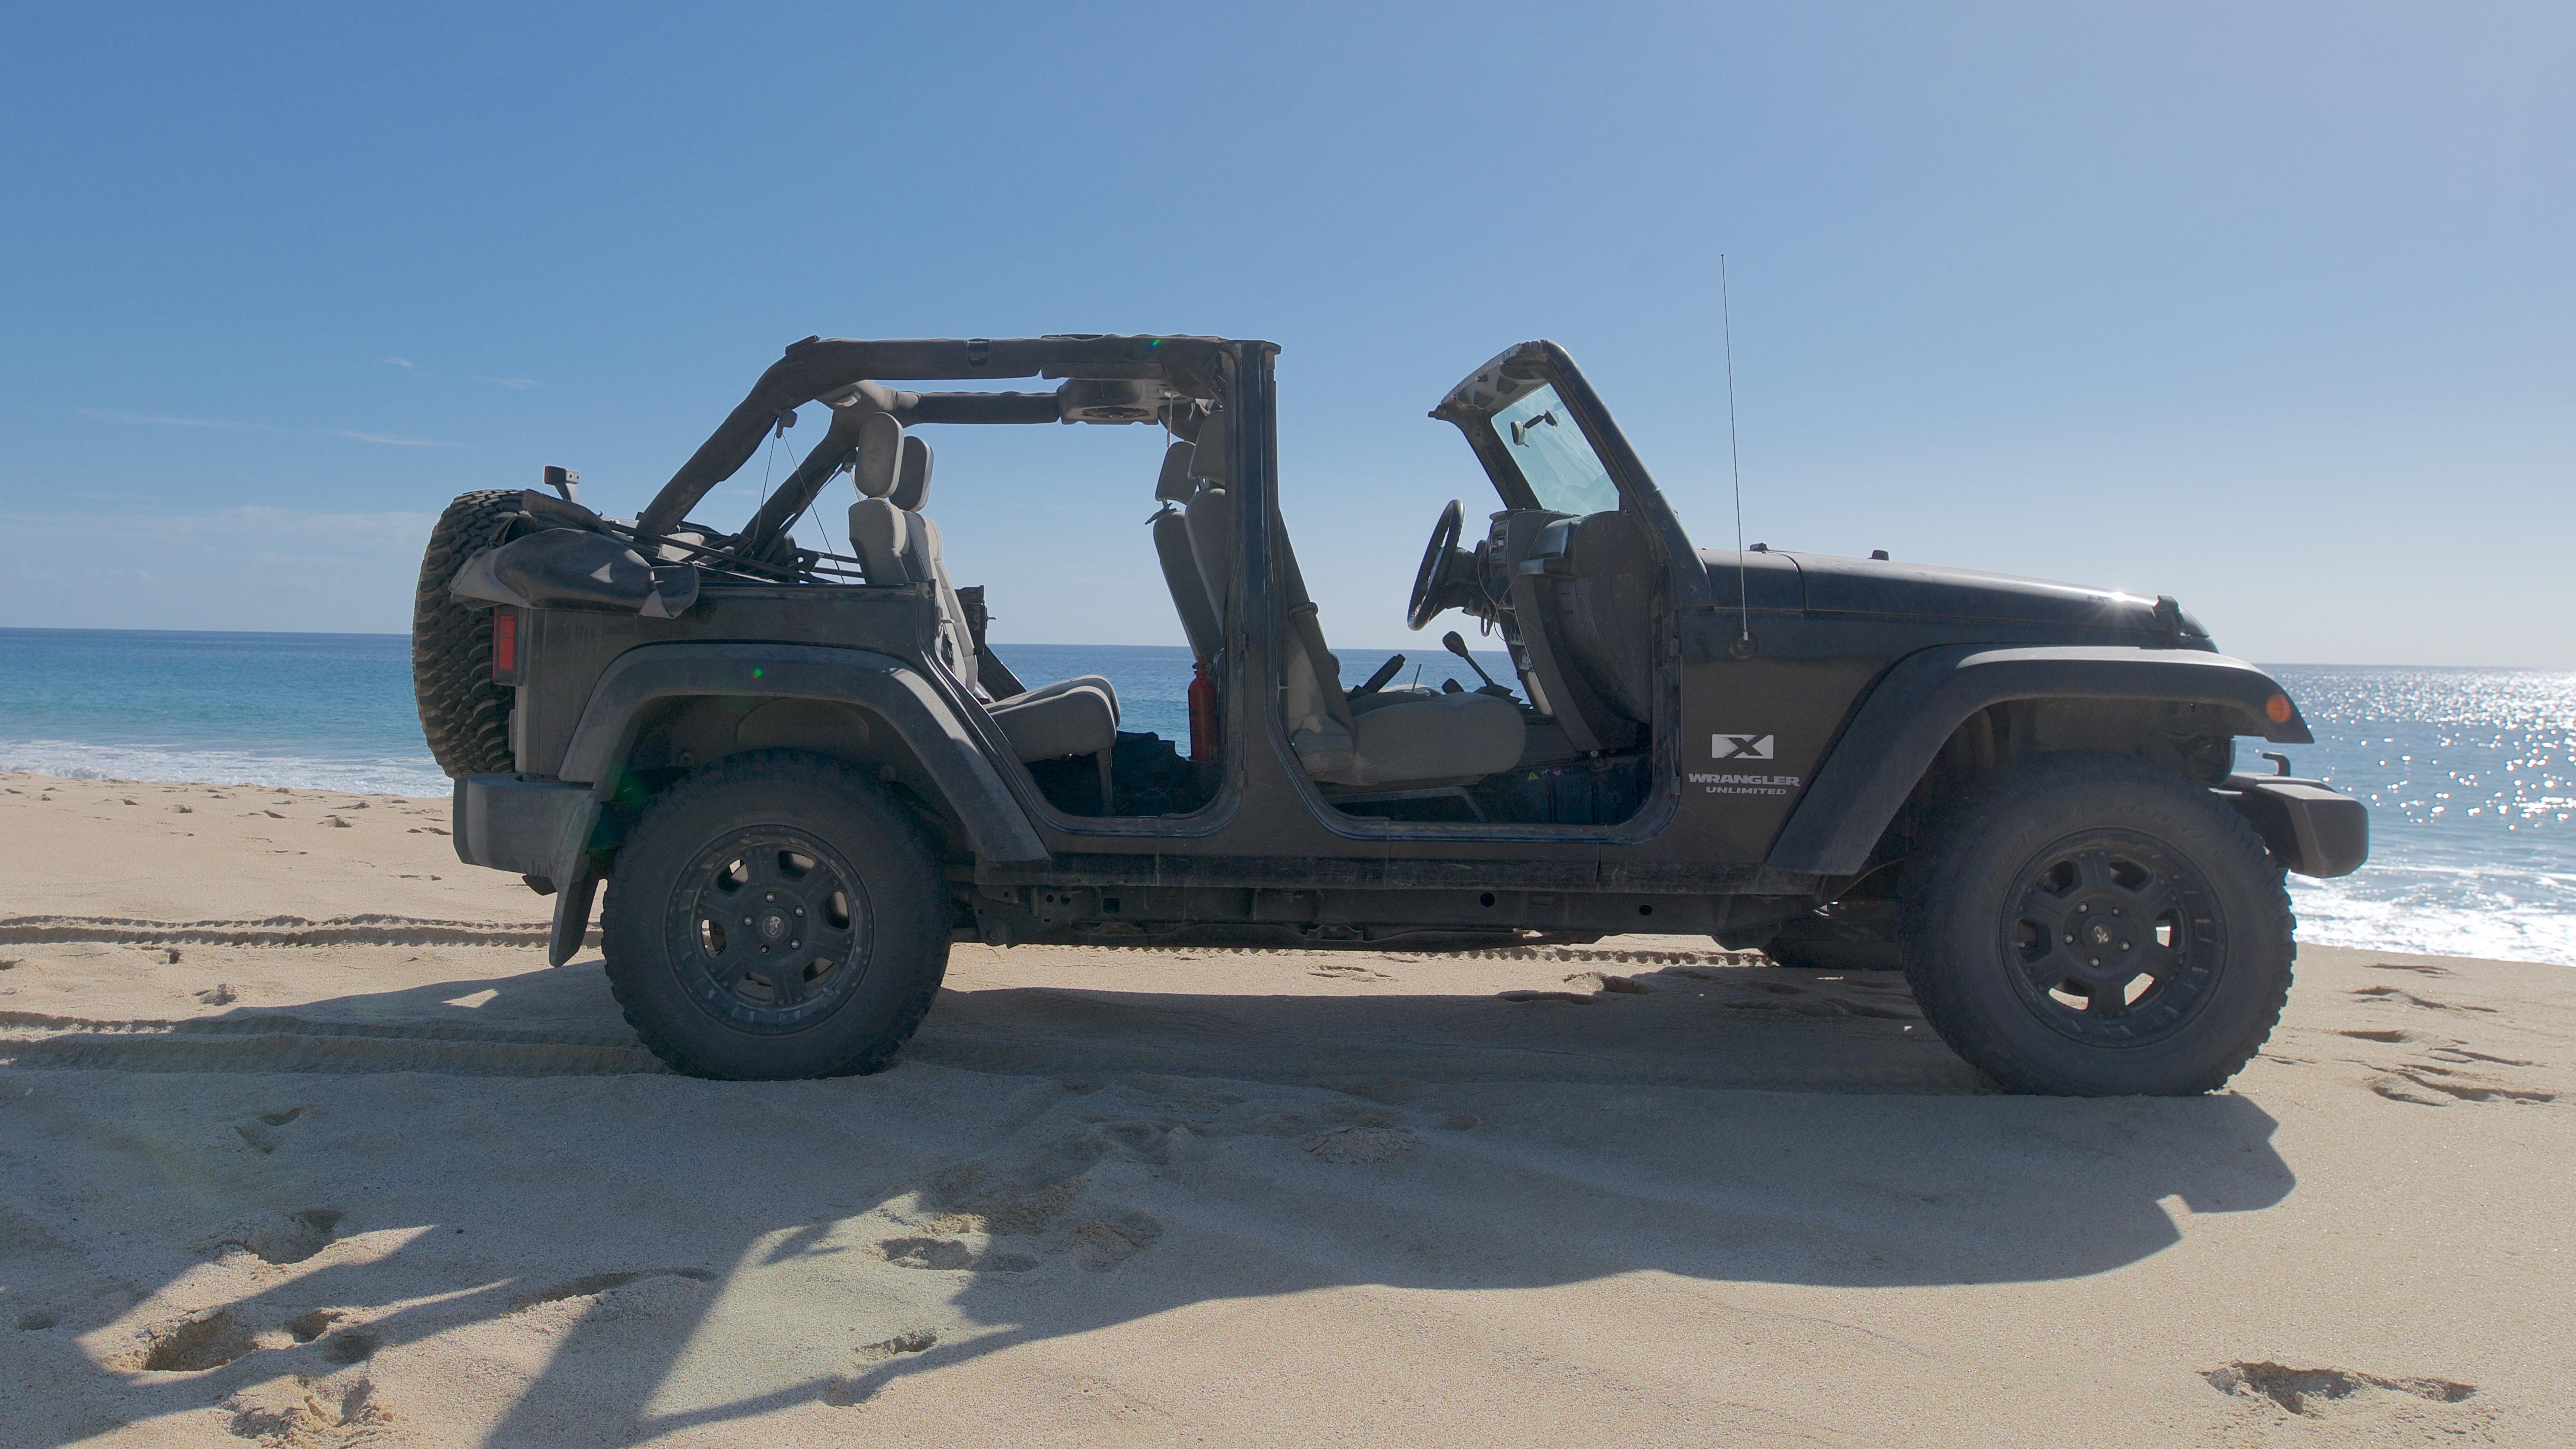 Jeep Wrangler in Baja California, Mexico. No doors